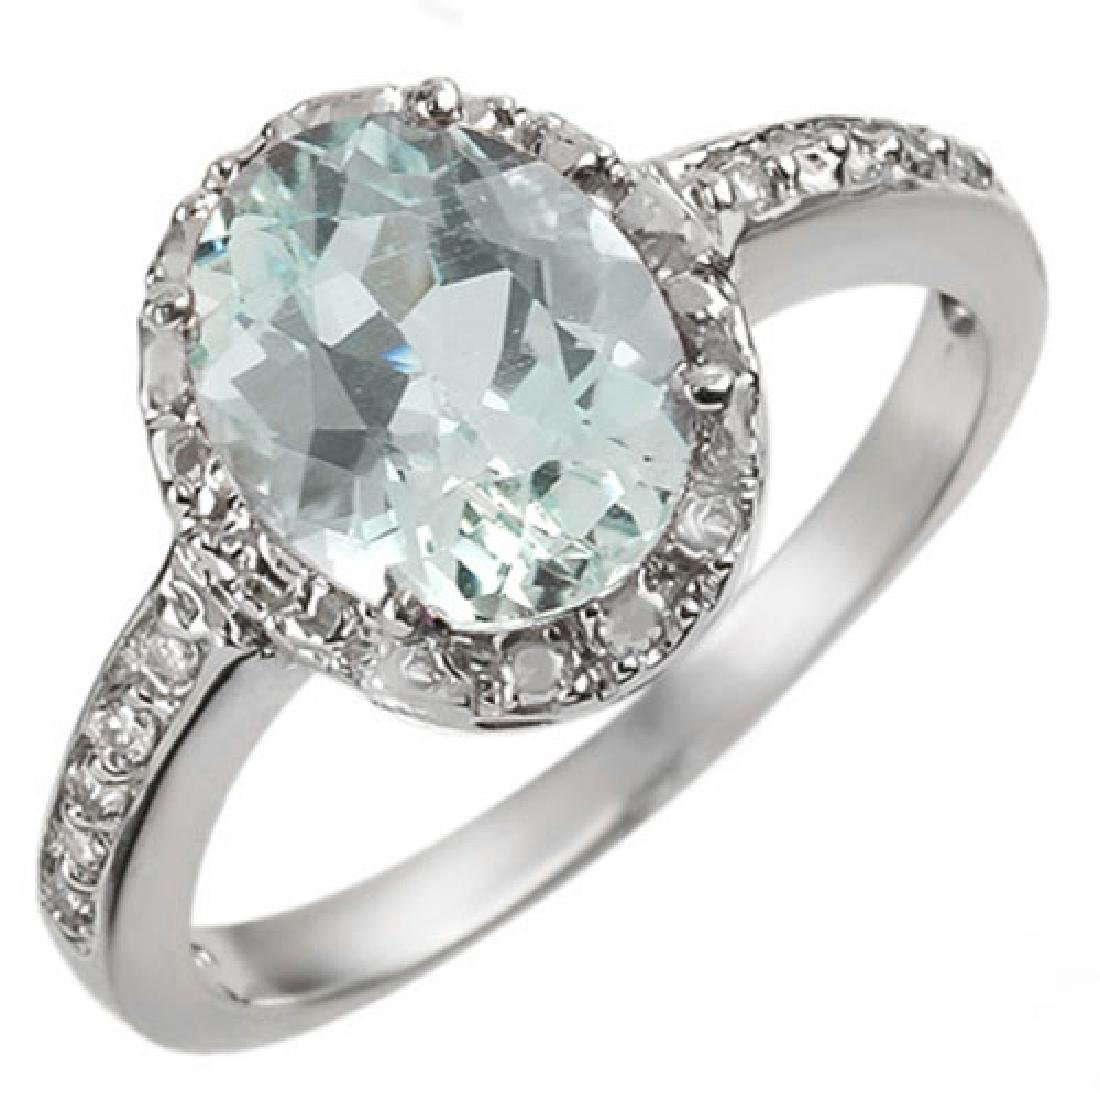 2.15 CTW Aquamarine & Diamond Ring 10K White Gold